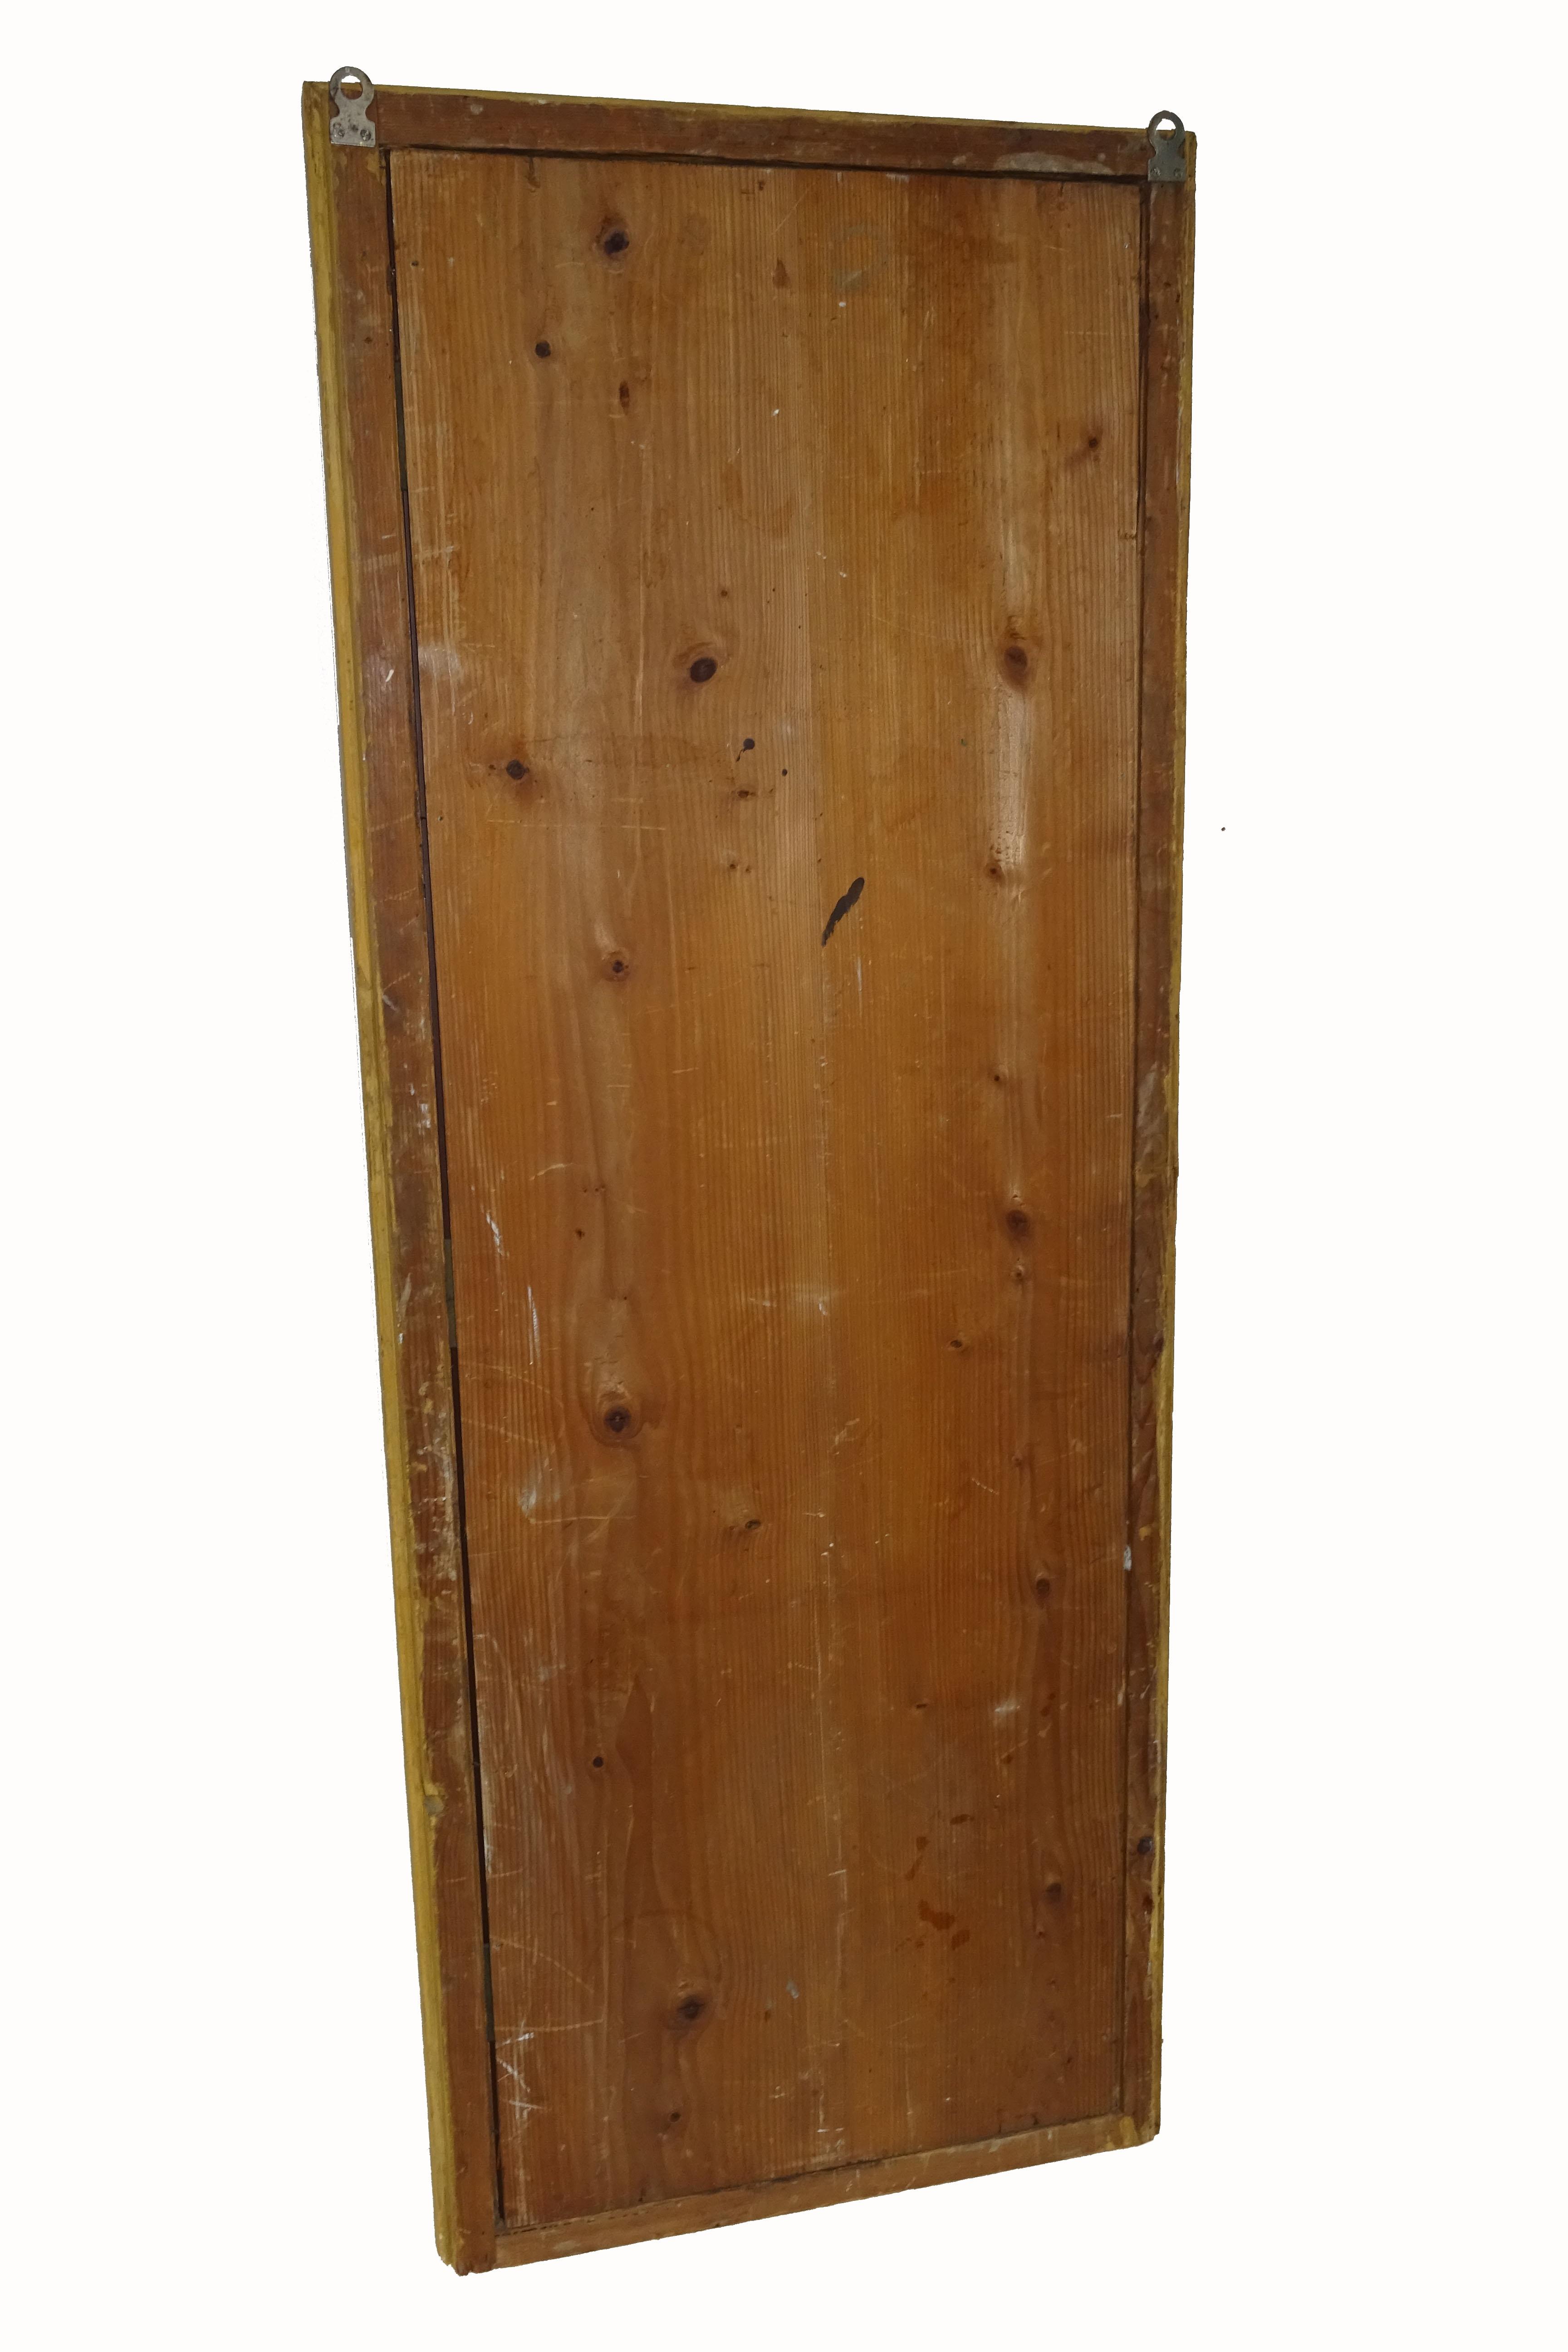 Verkauft: Grosser antiker Spiegel 31, ca 1820 - Edeltrödel - Antike ...